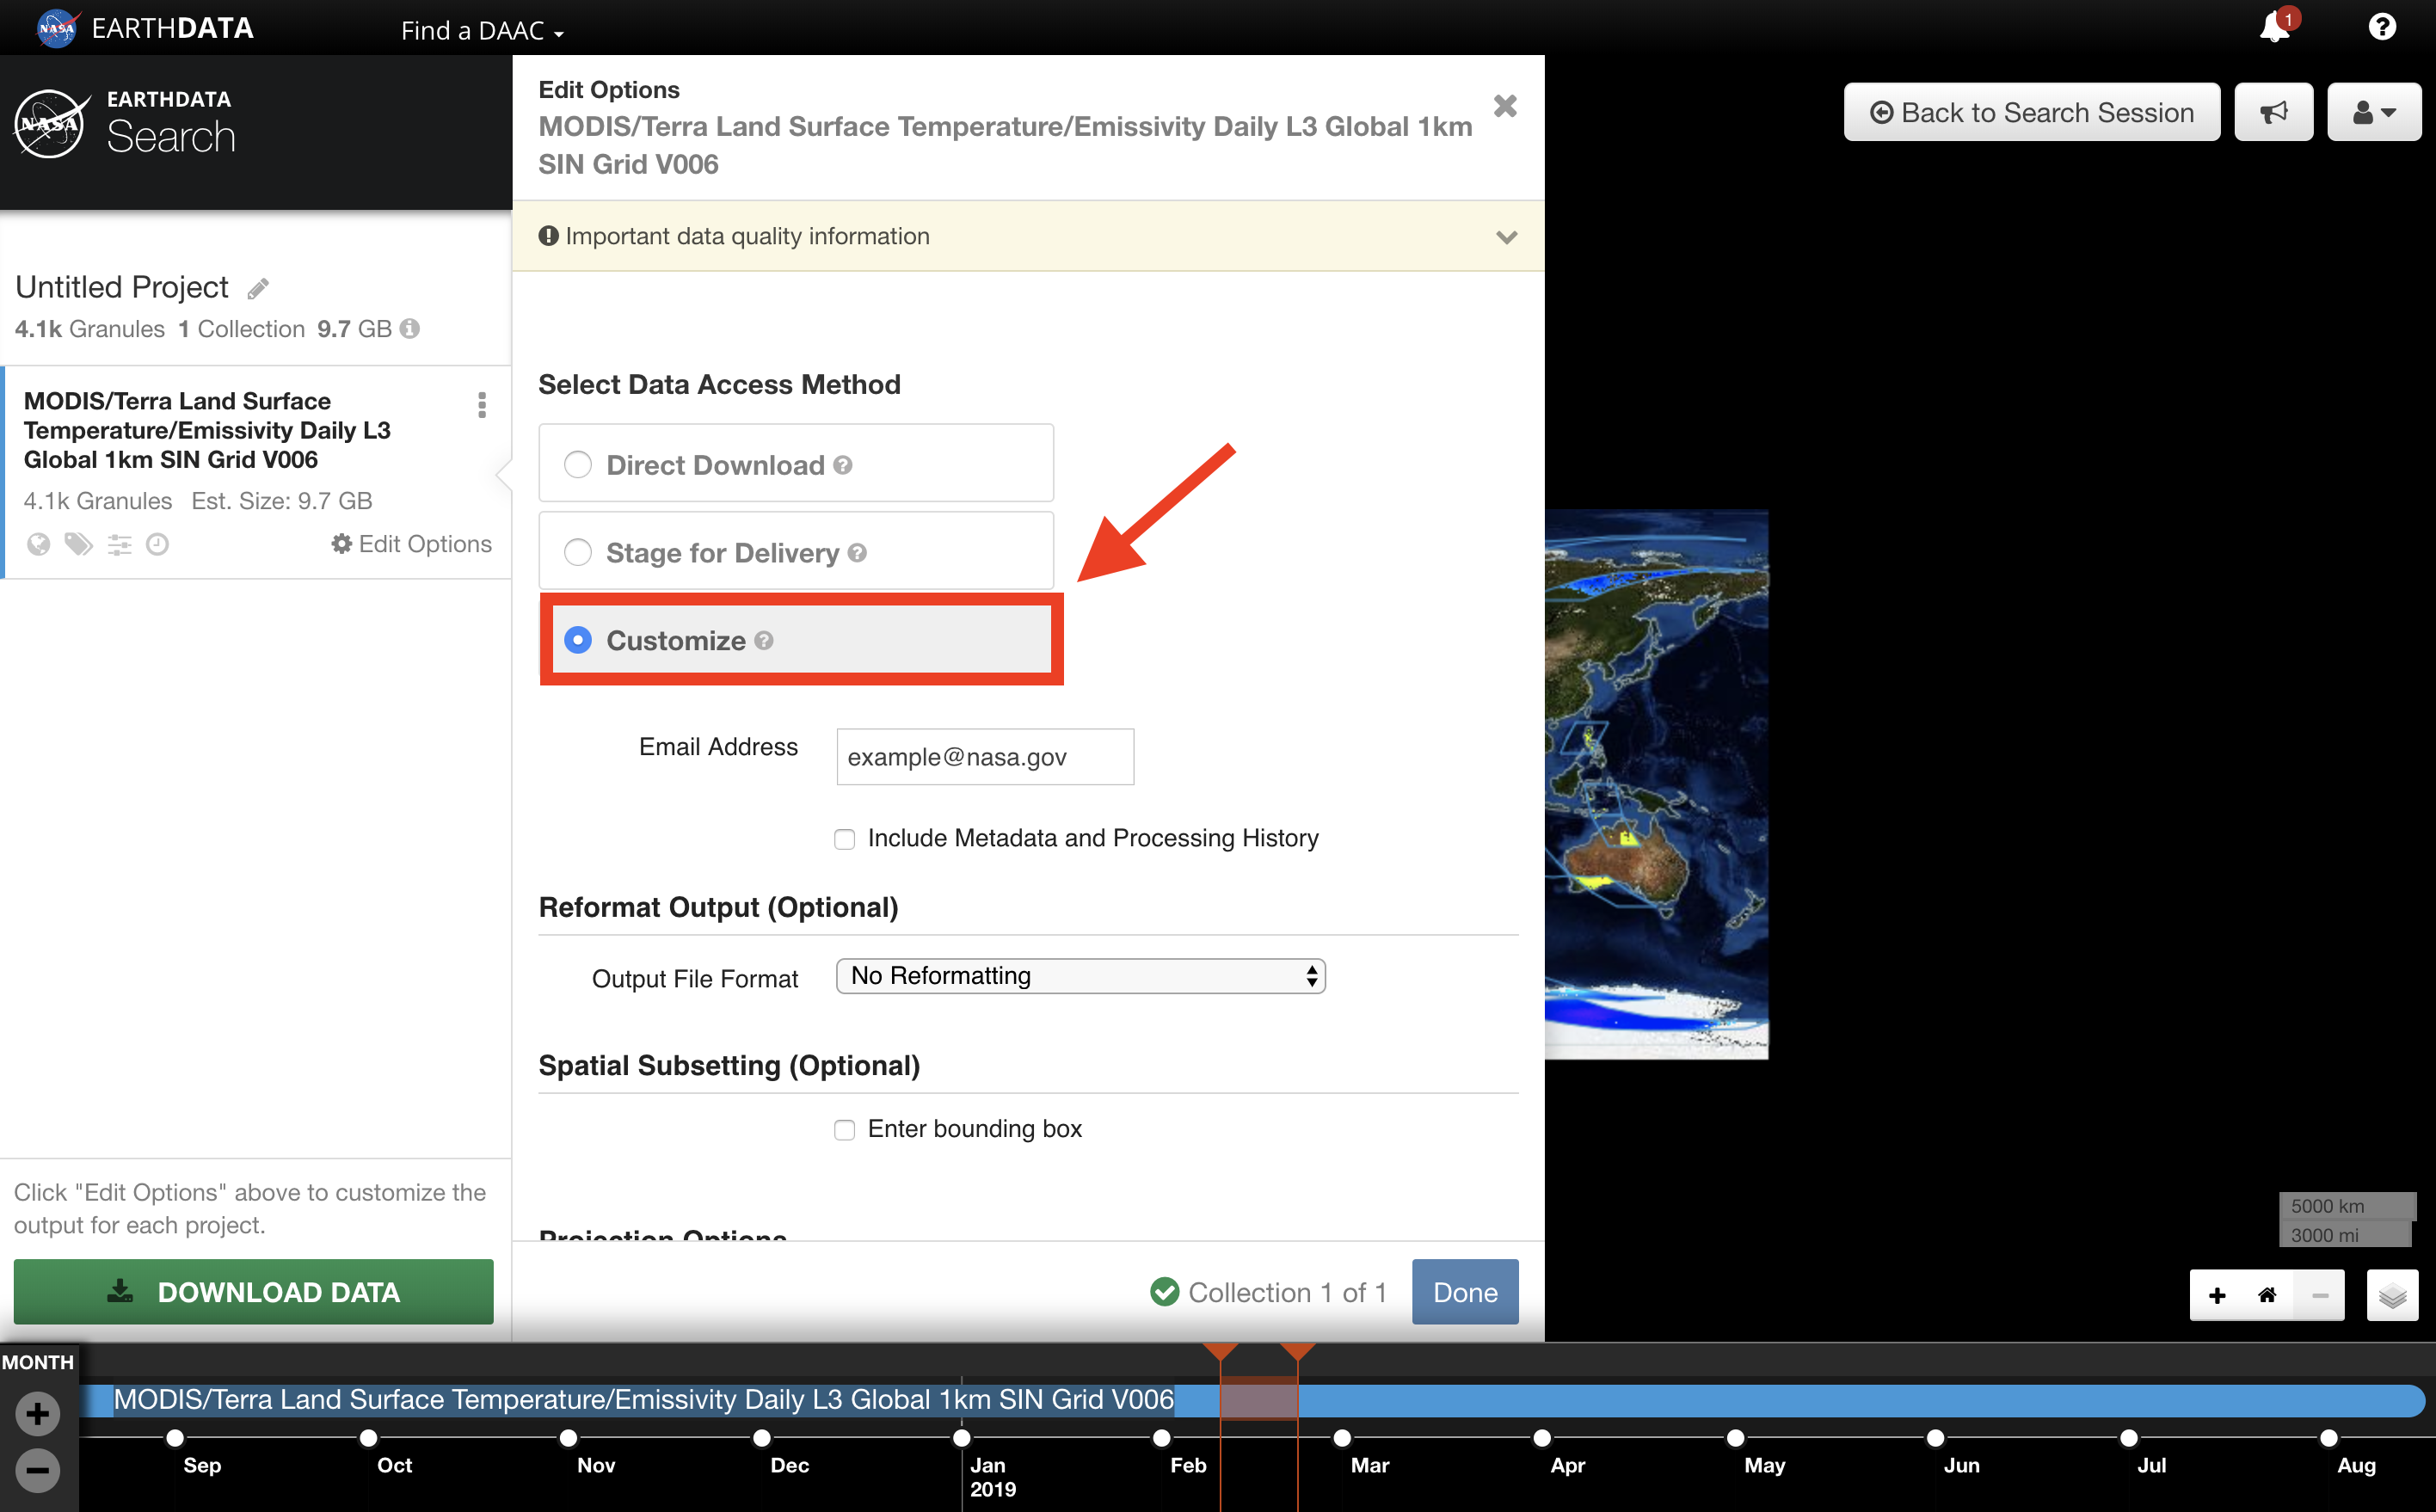 Earthdata Search Custom 6